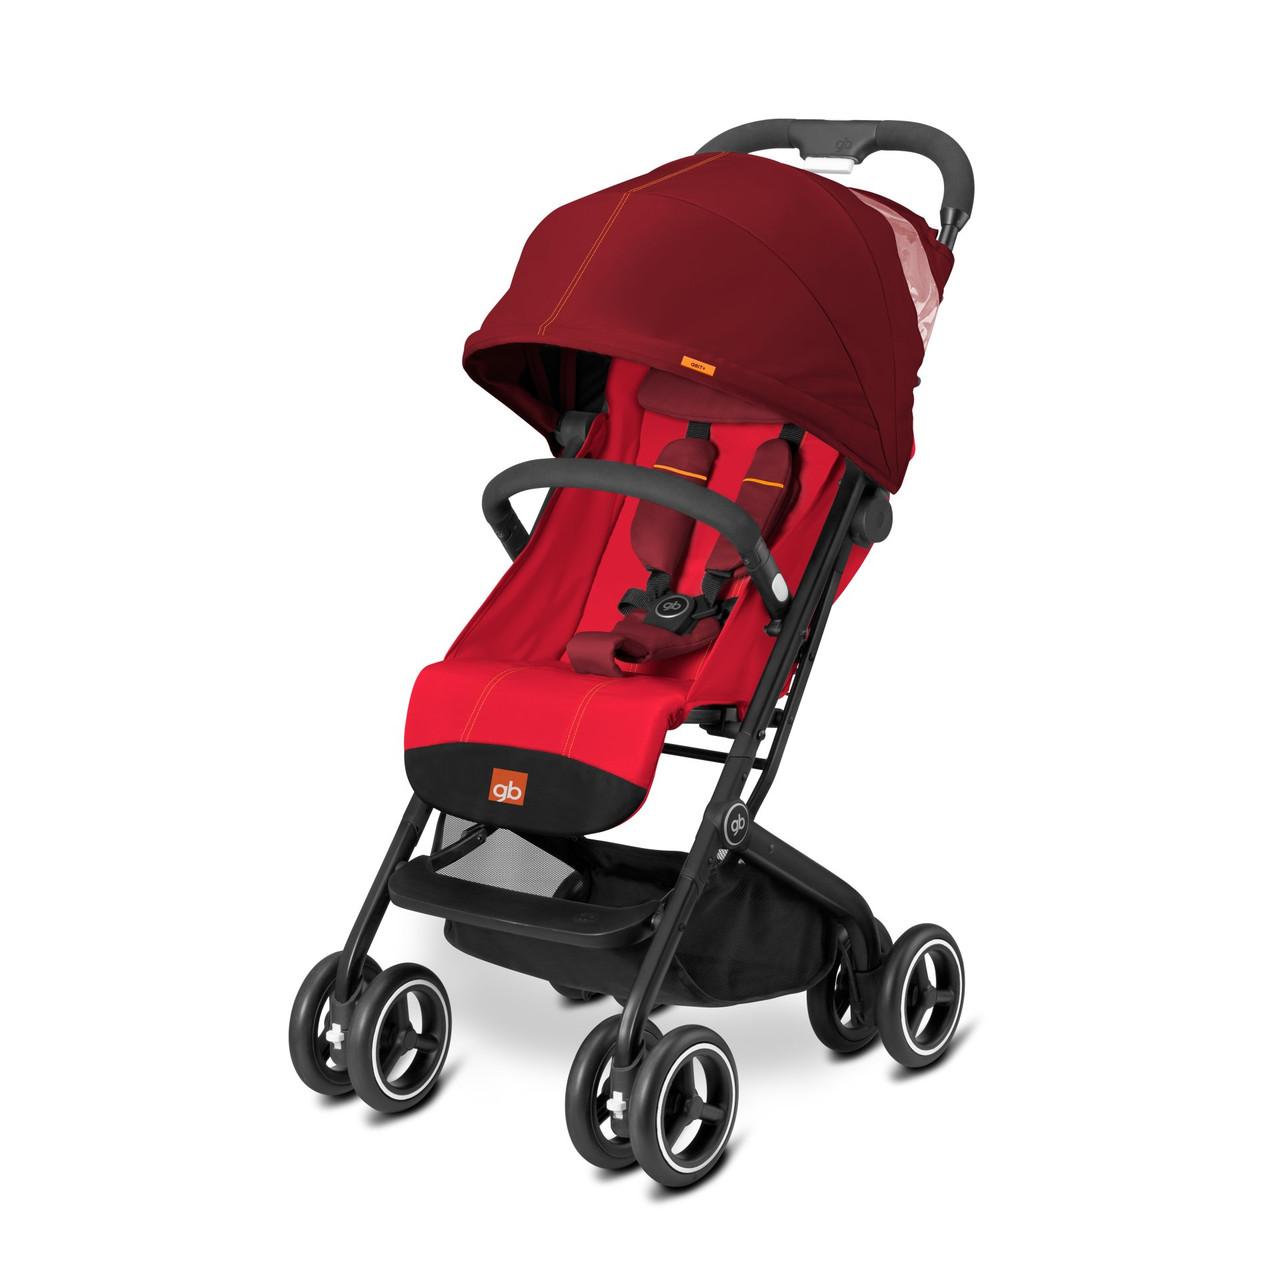 Прогулочная коляска «gb» Qbit+ (616240009), цвет Dragonfire Red (красный) «gb» (616240009)